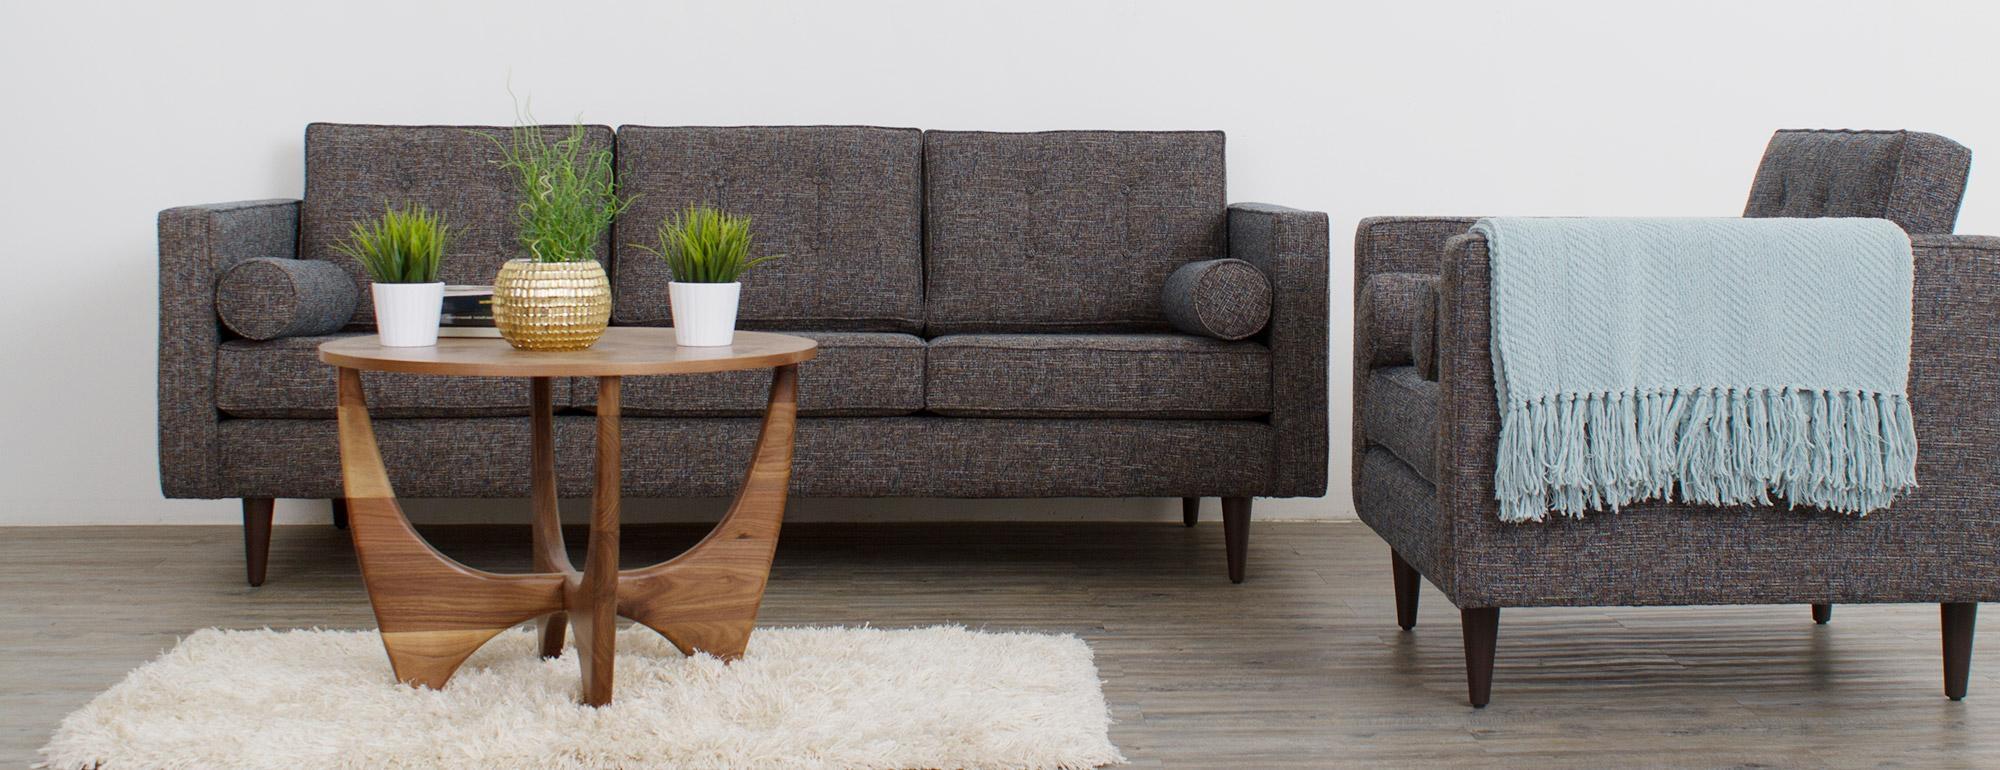 Braxton Sofa | Joybird Regarding Braxton Sofas (Image 14 of 20)